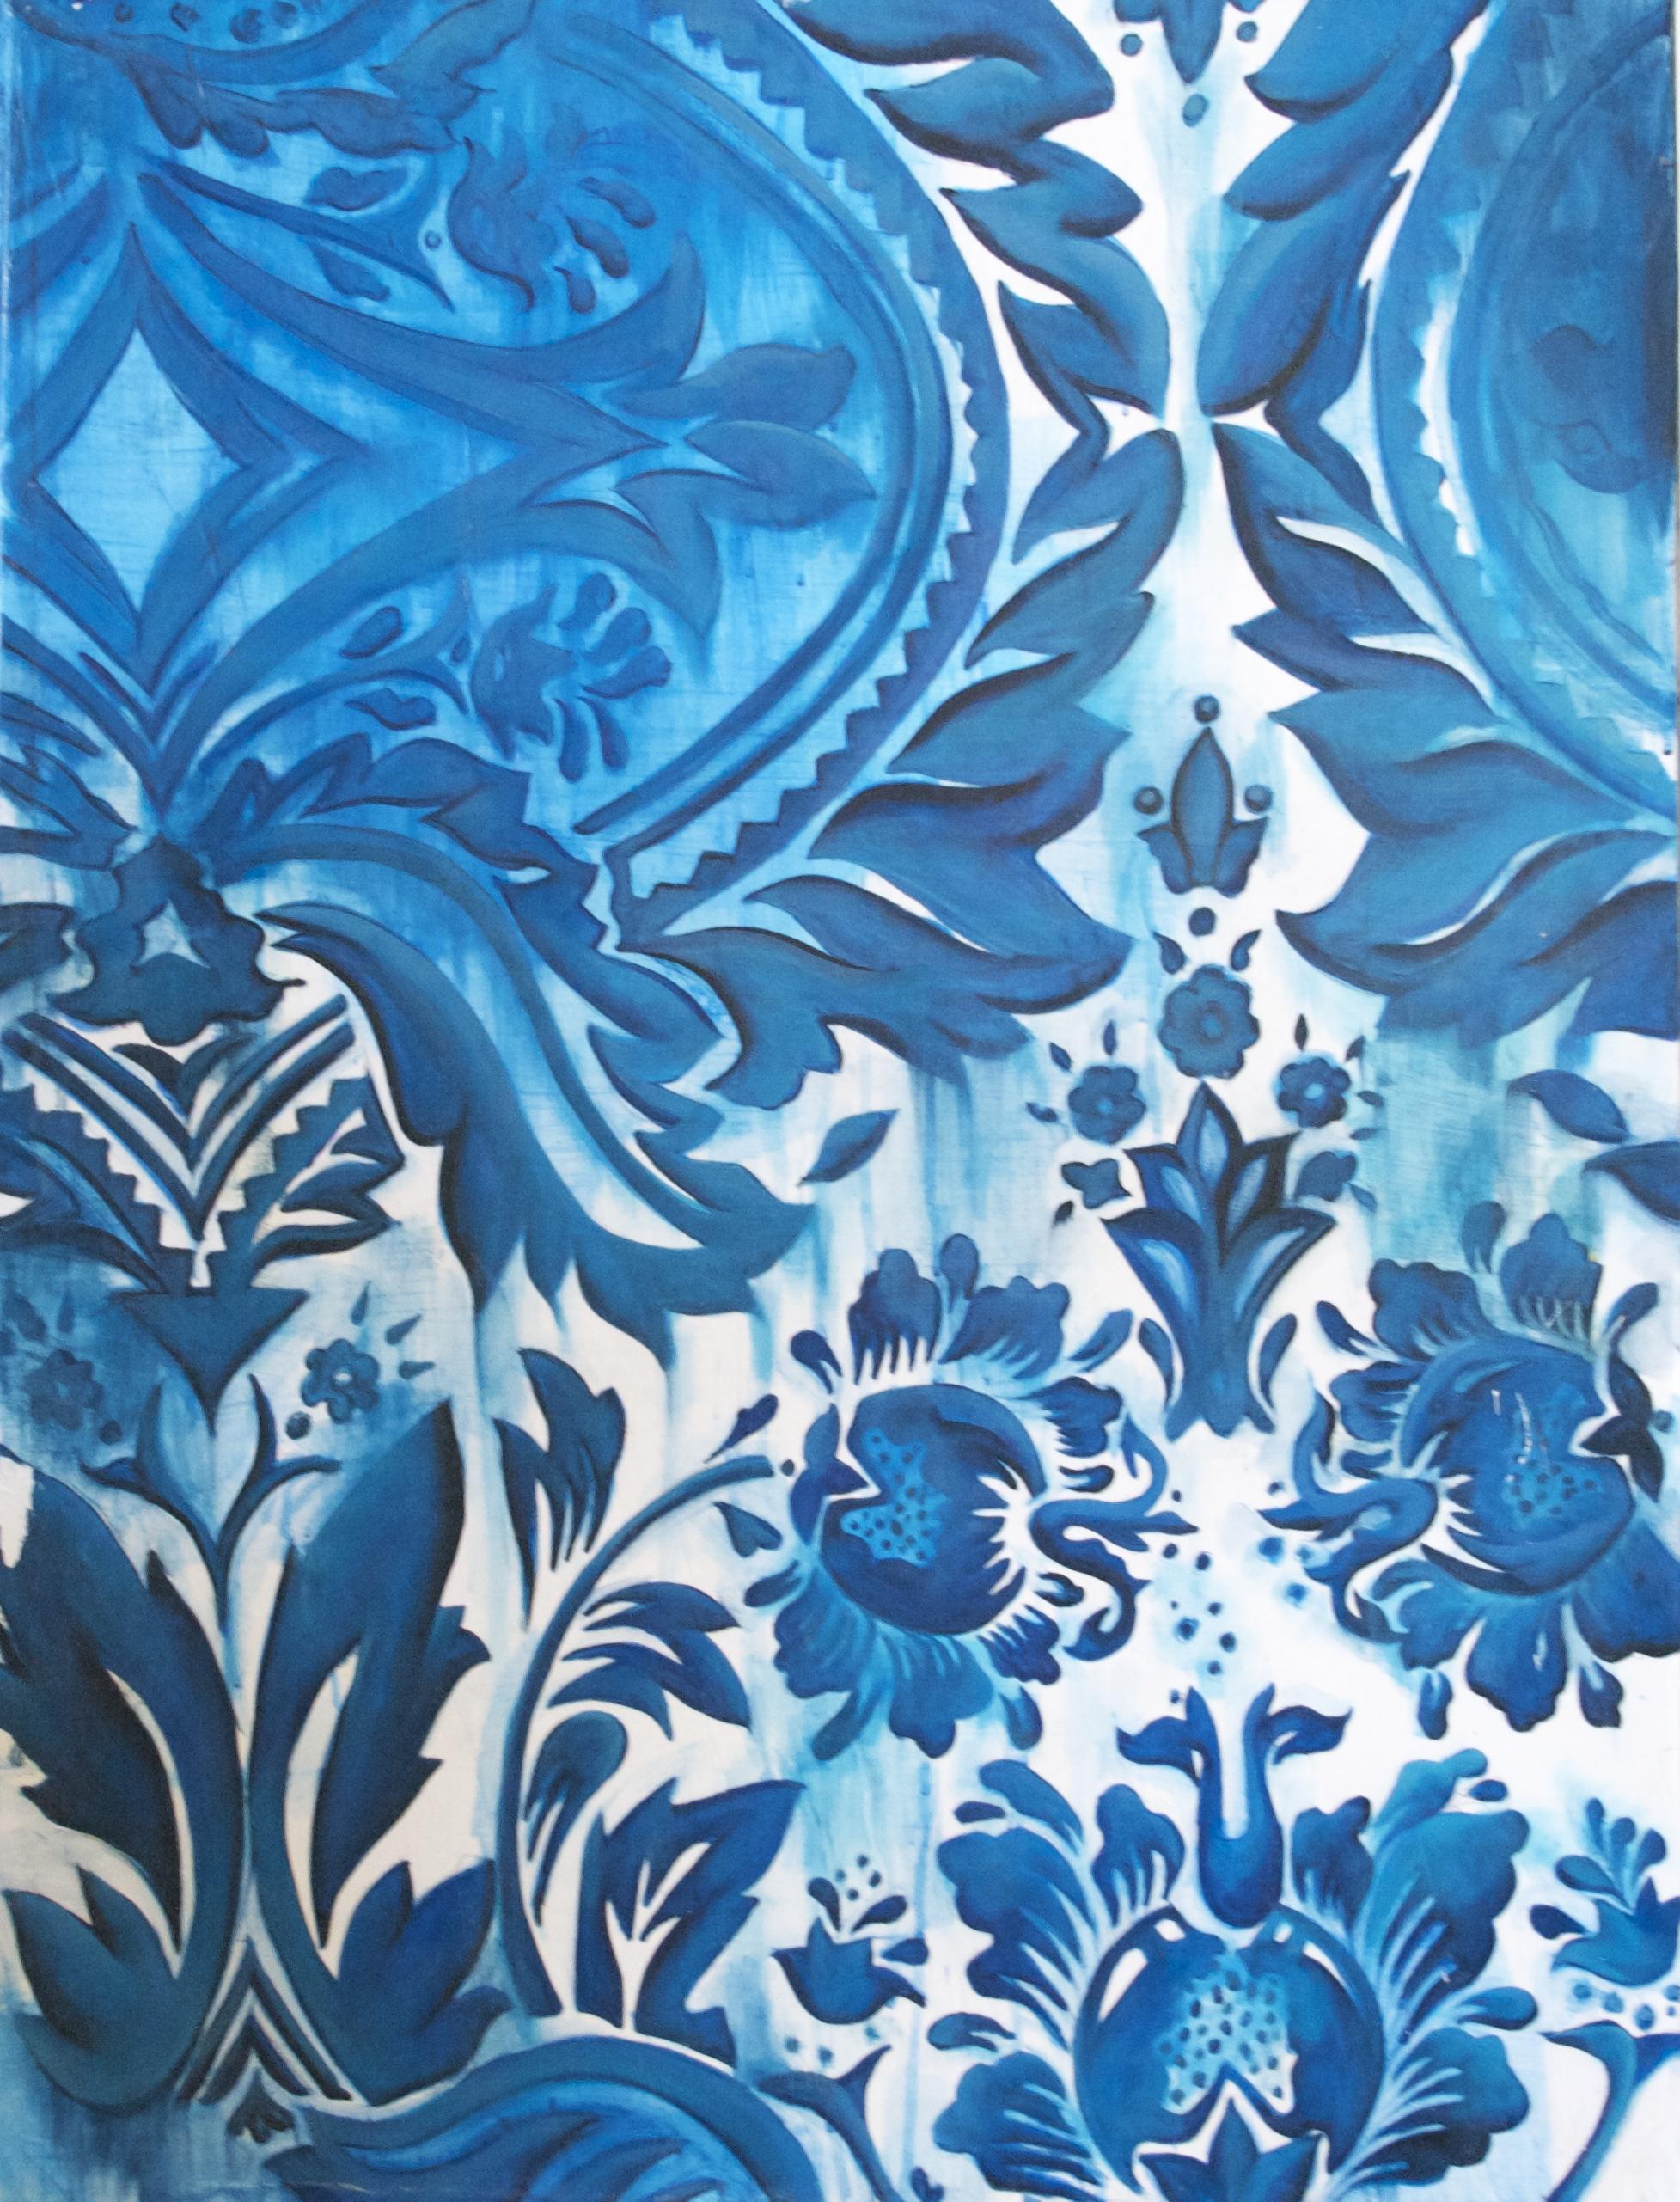 Distorted Blue Print